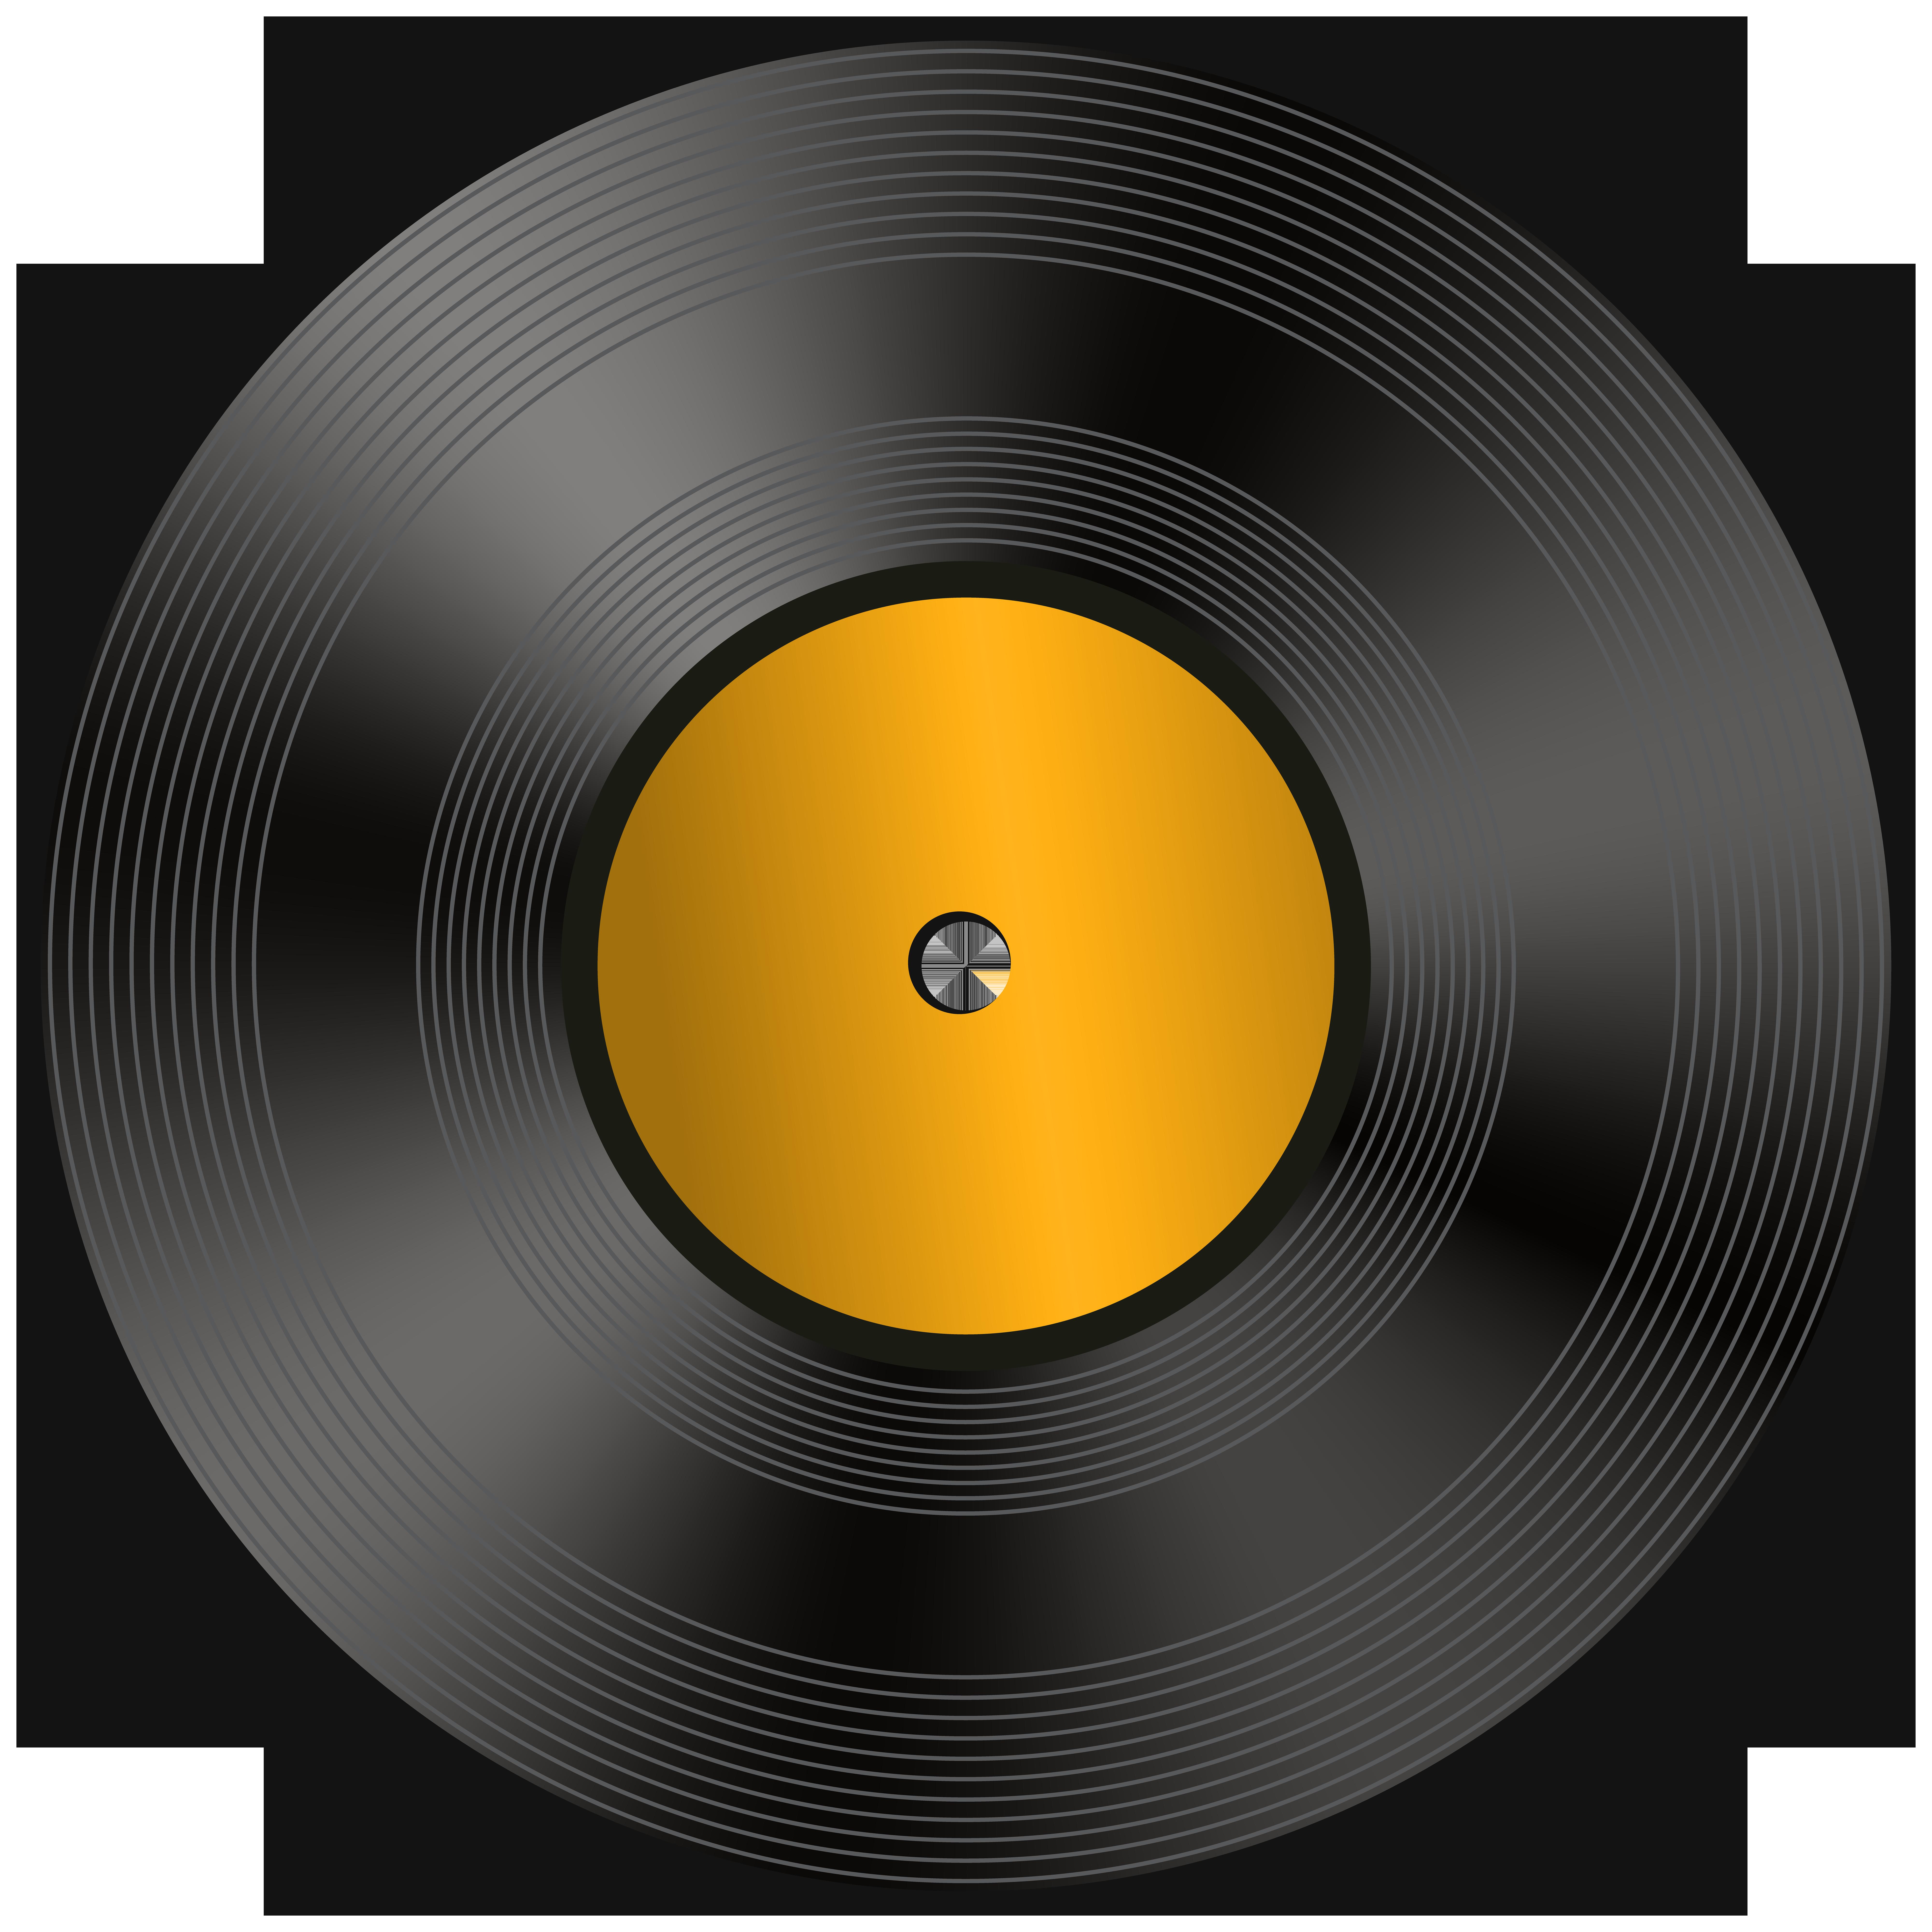 Vinyl Record PNG Clip Art Image | Gallery Yopriceville ... clip art stock